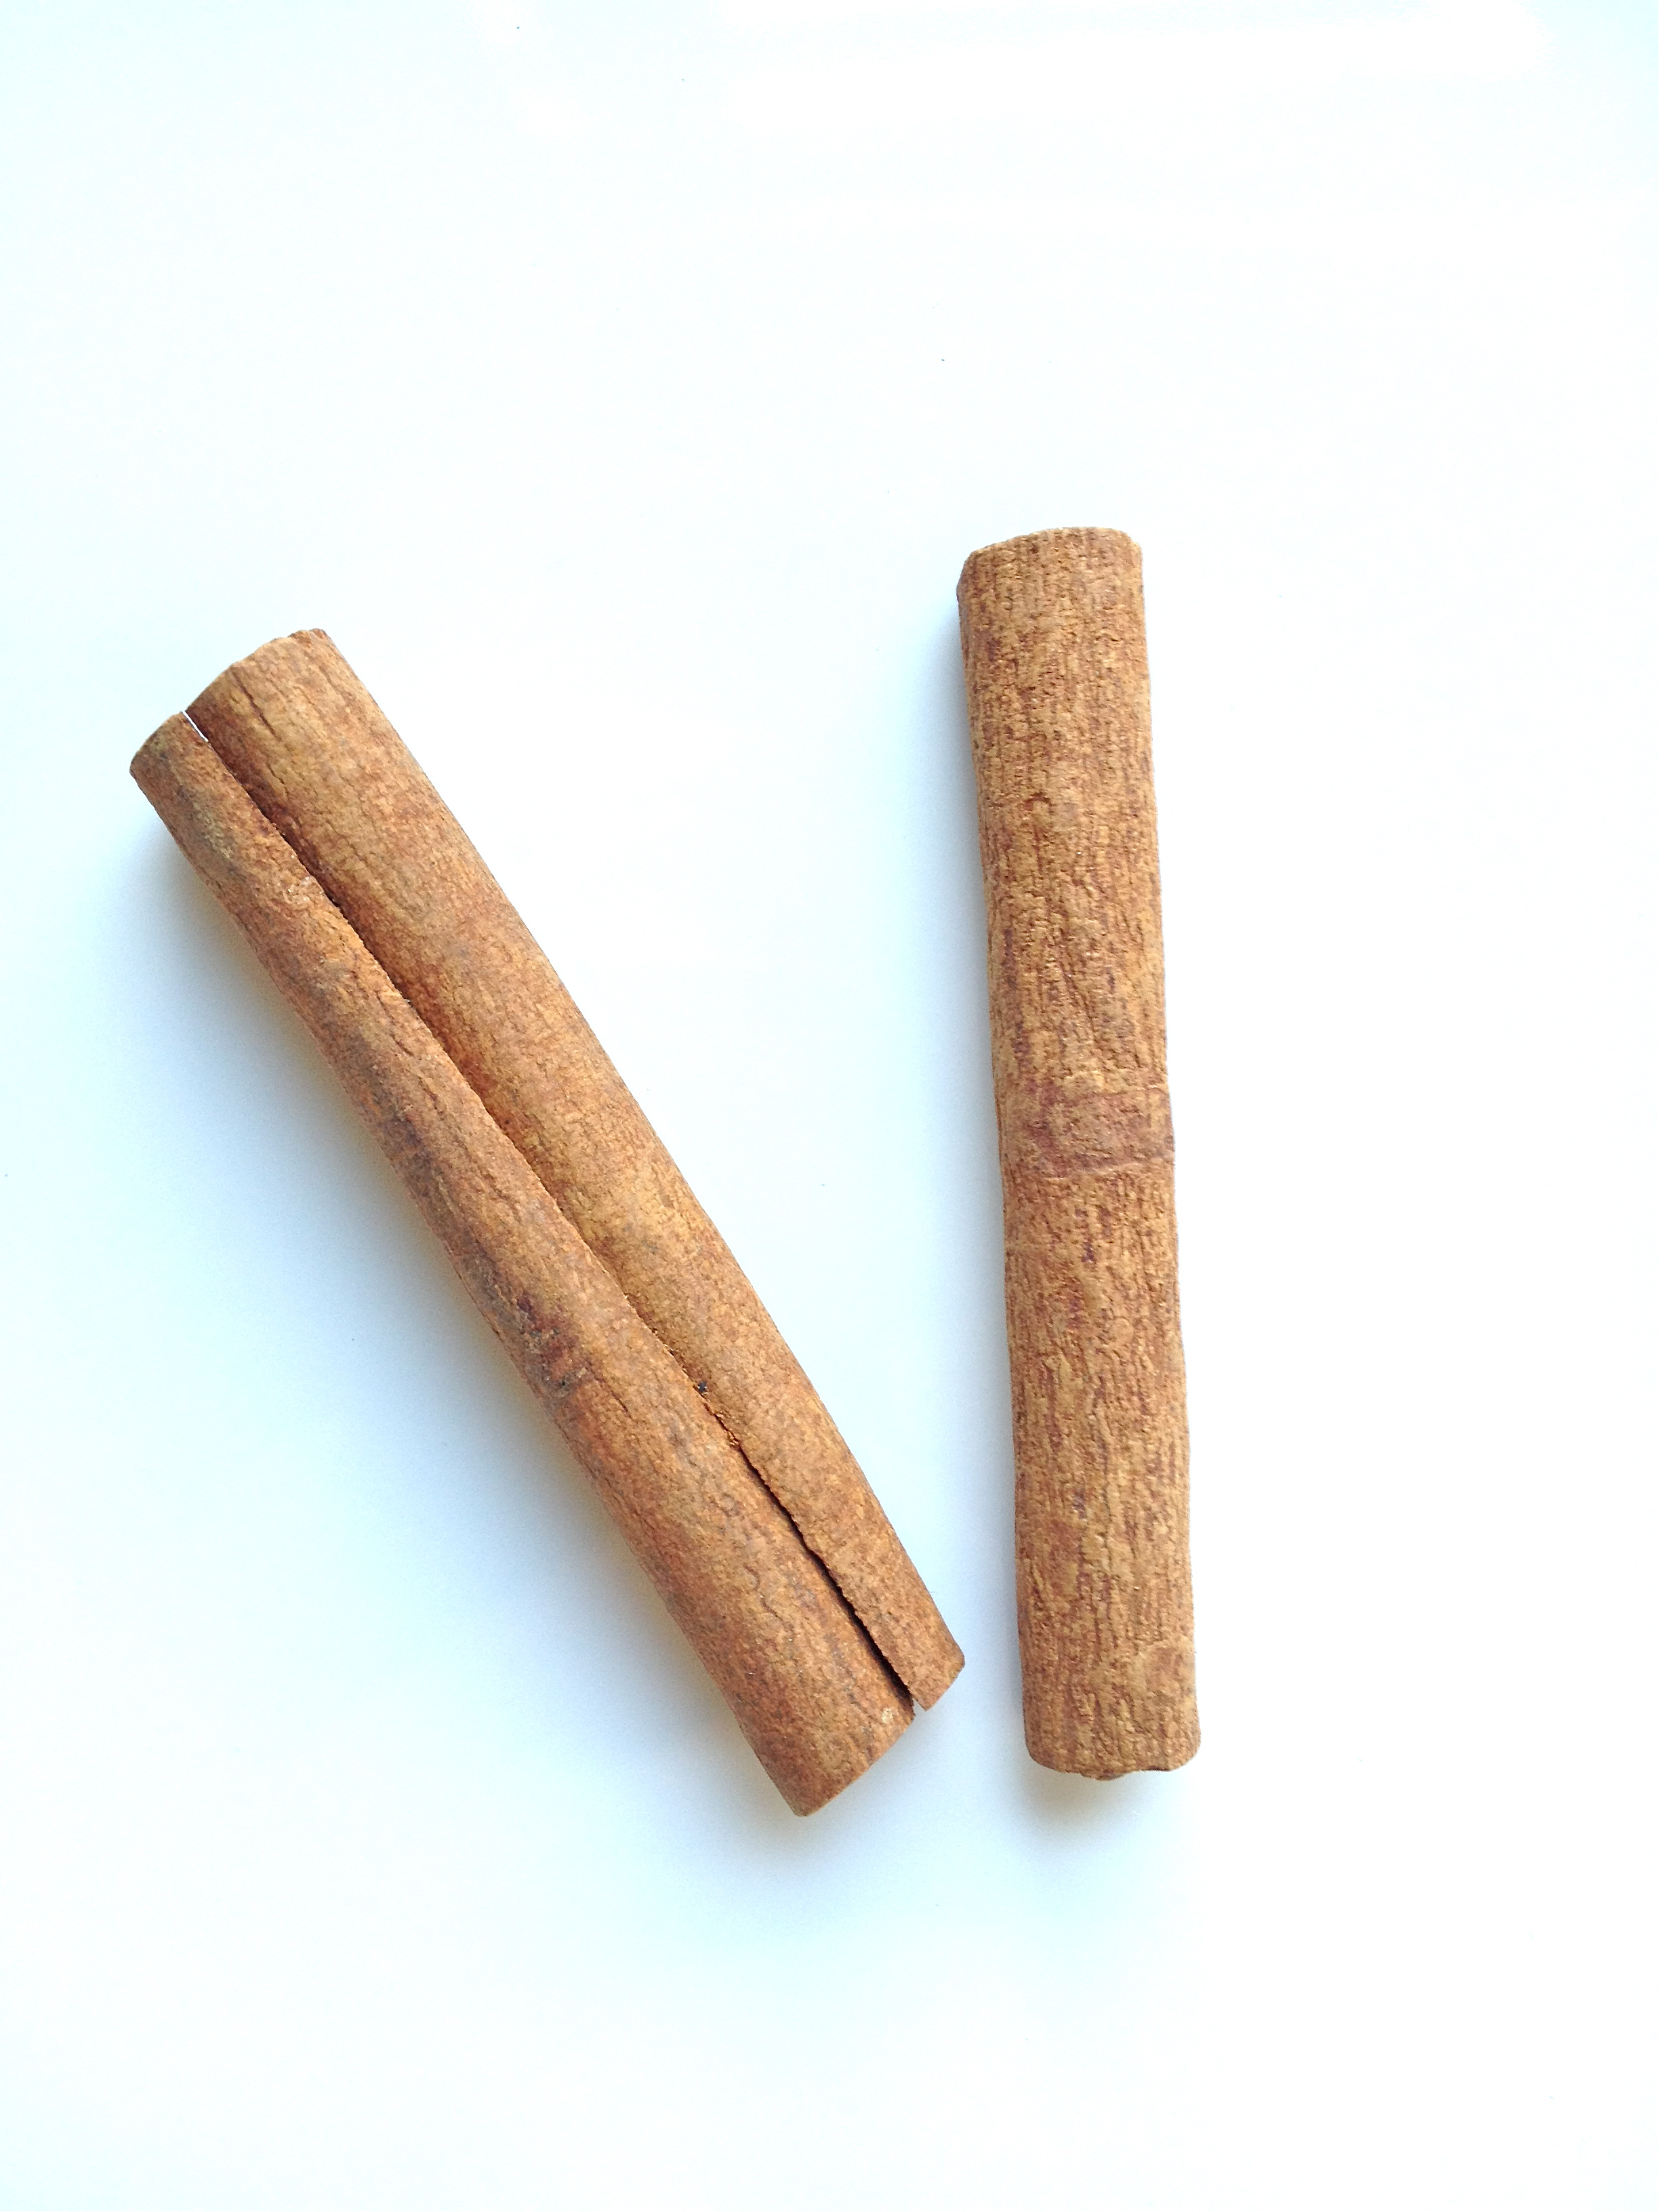 Cinnamon Sticks - Cassia